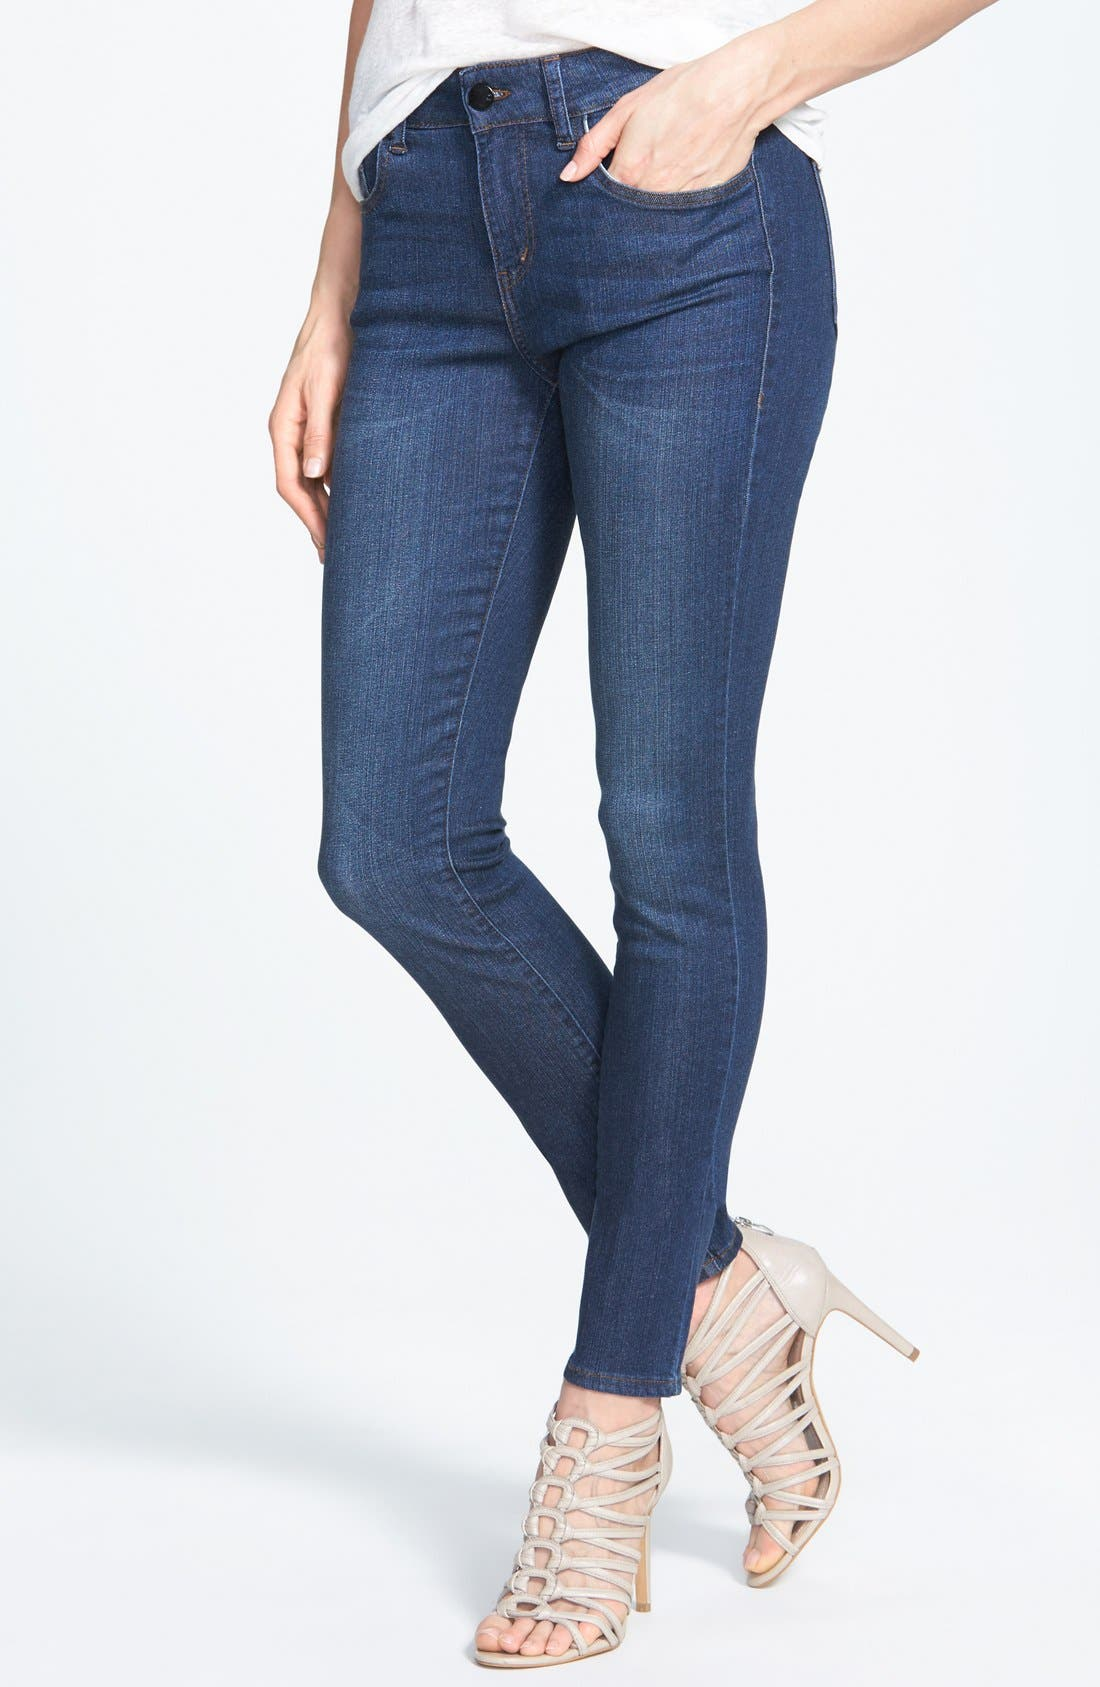 Alternate Image 1 Selected - !iT Collective 'Lauren' Stretch Skinny Jeans (Blue Velvet)